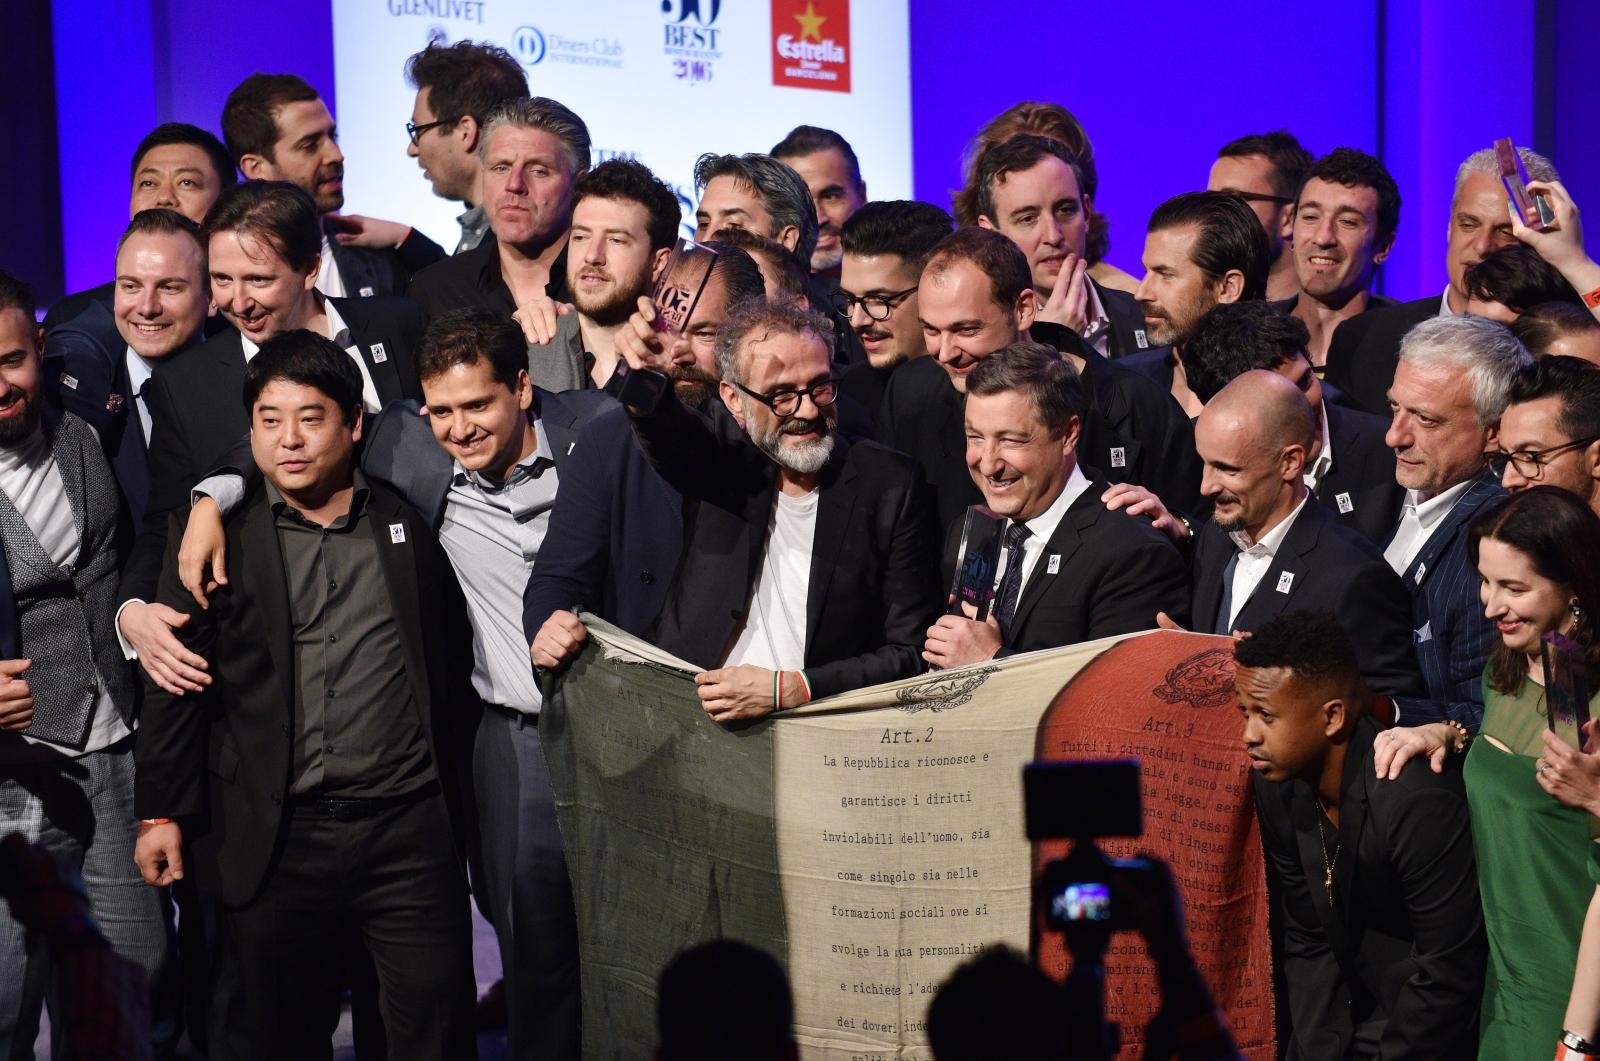 Massimo Batturo celebrates winning with other chefs